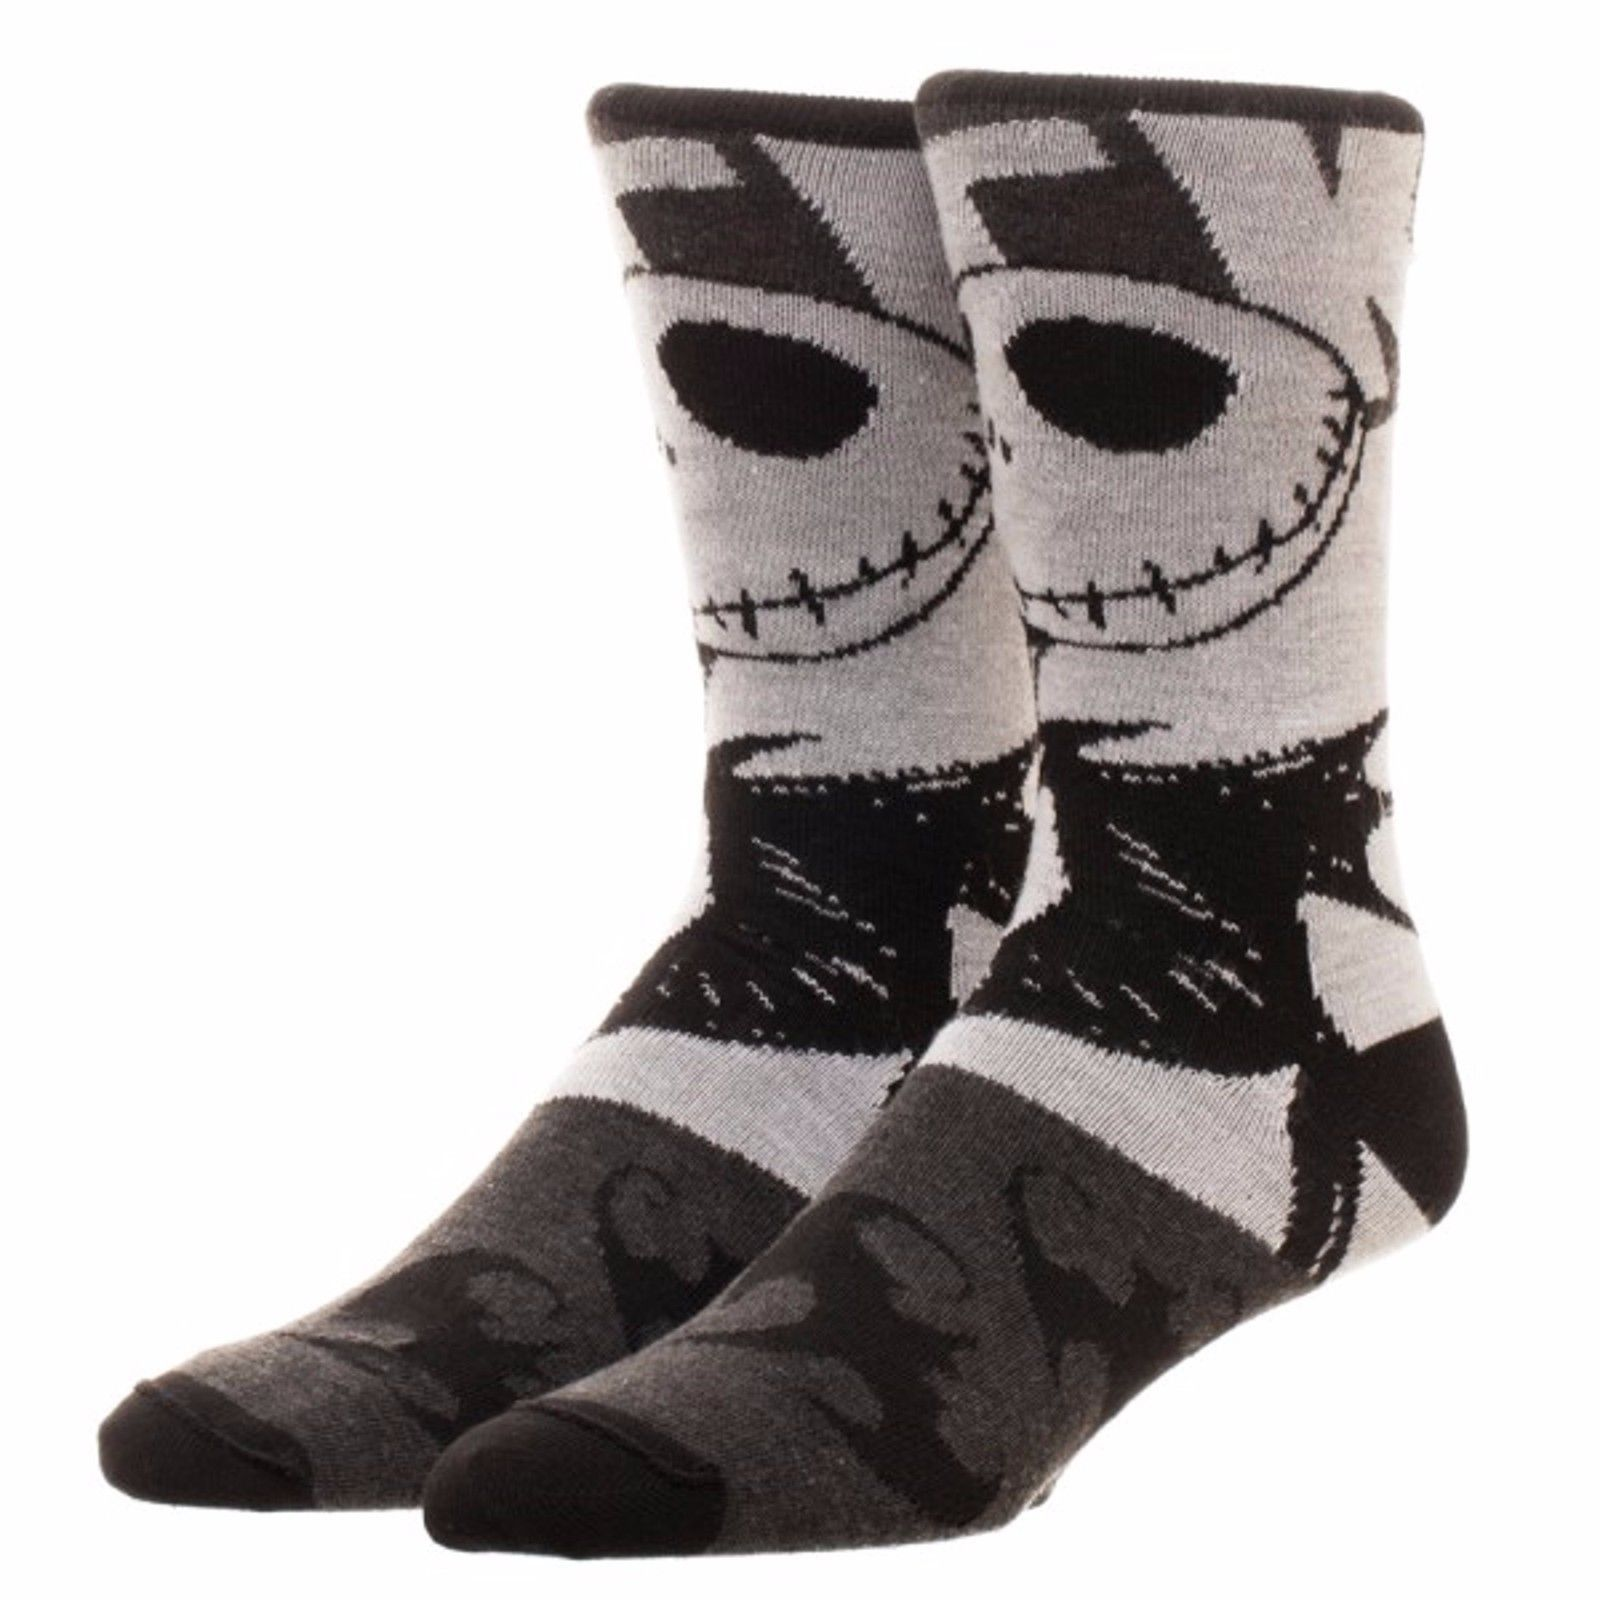 Jack & Sally - Reversible Crew Socks | Men\'s | at Mighty Ape NZ